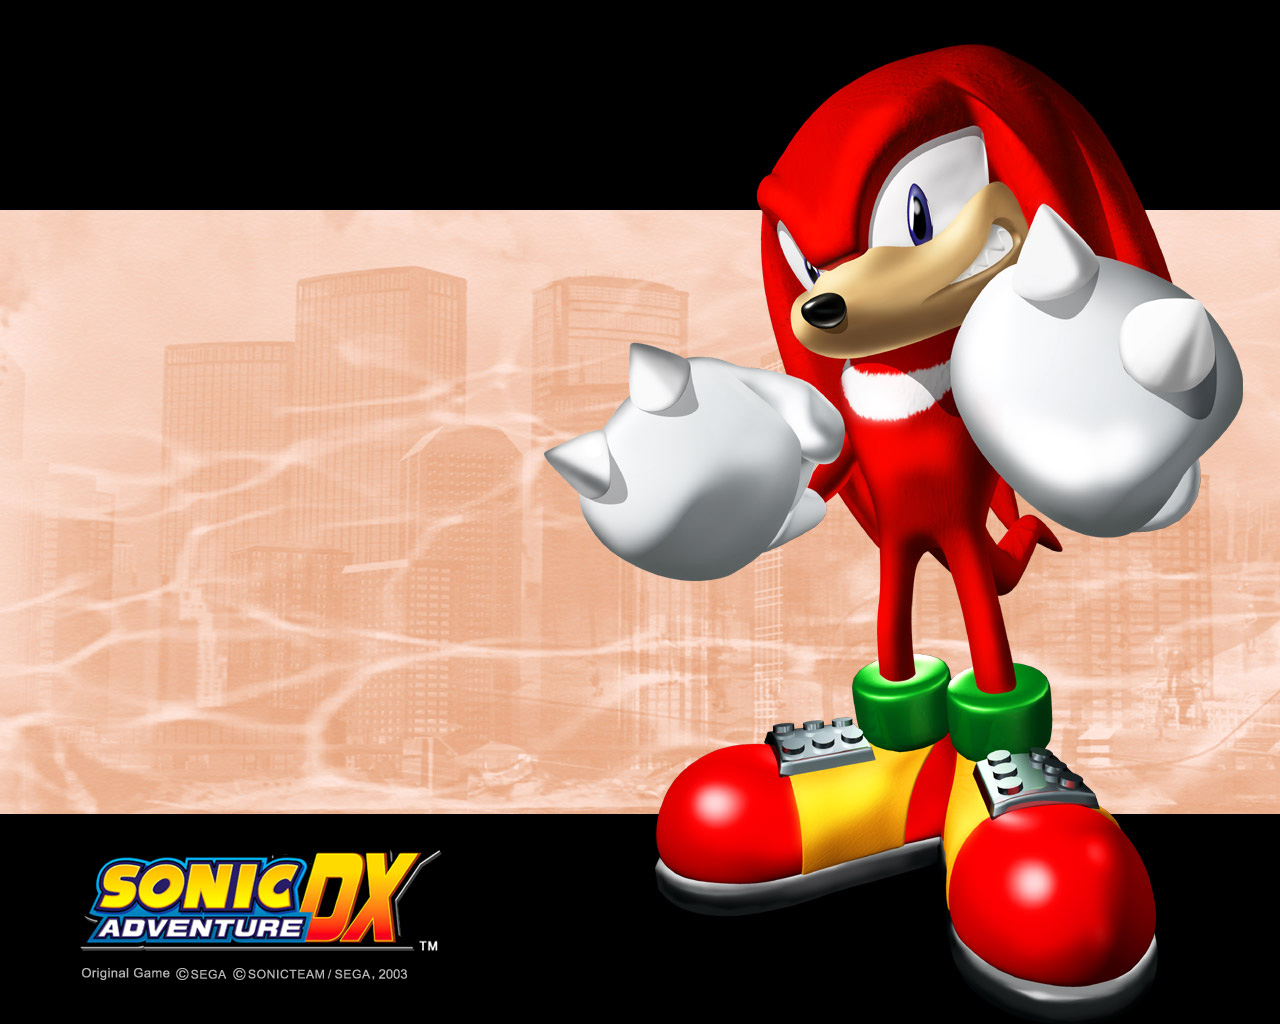 Sonic Adventure Dx Clipart.